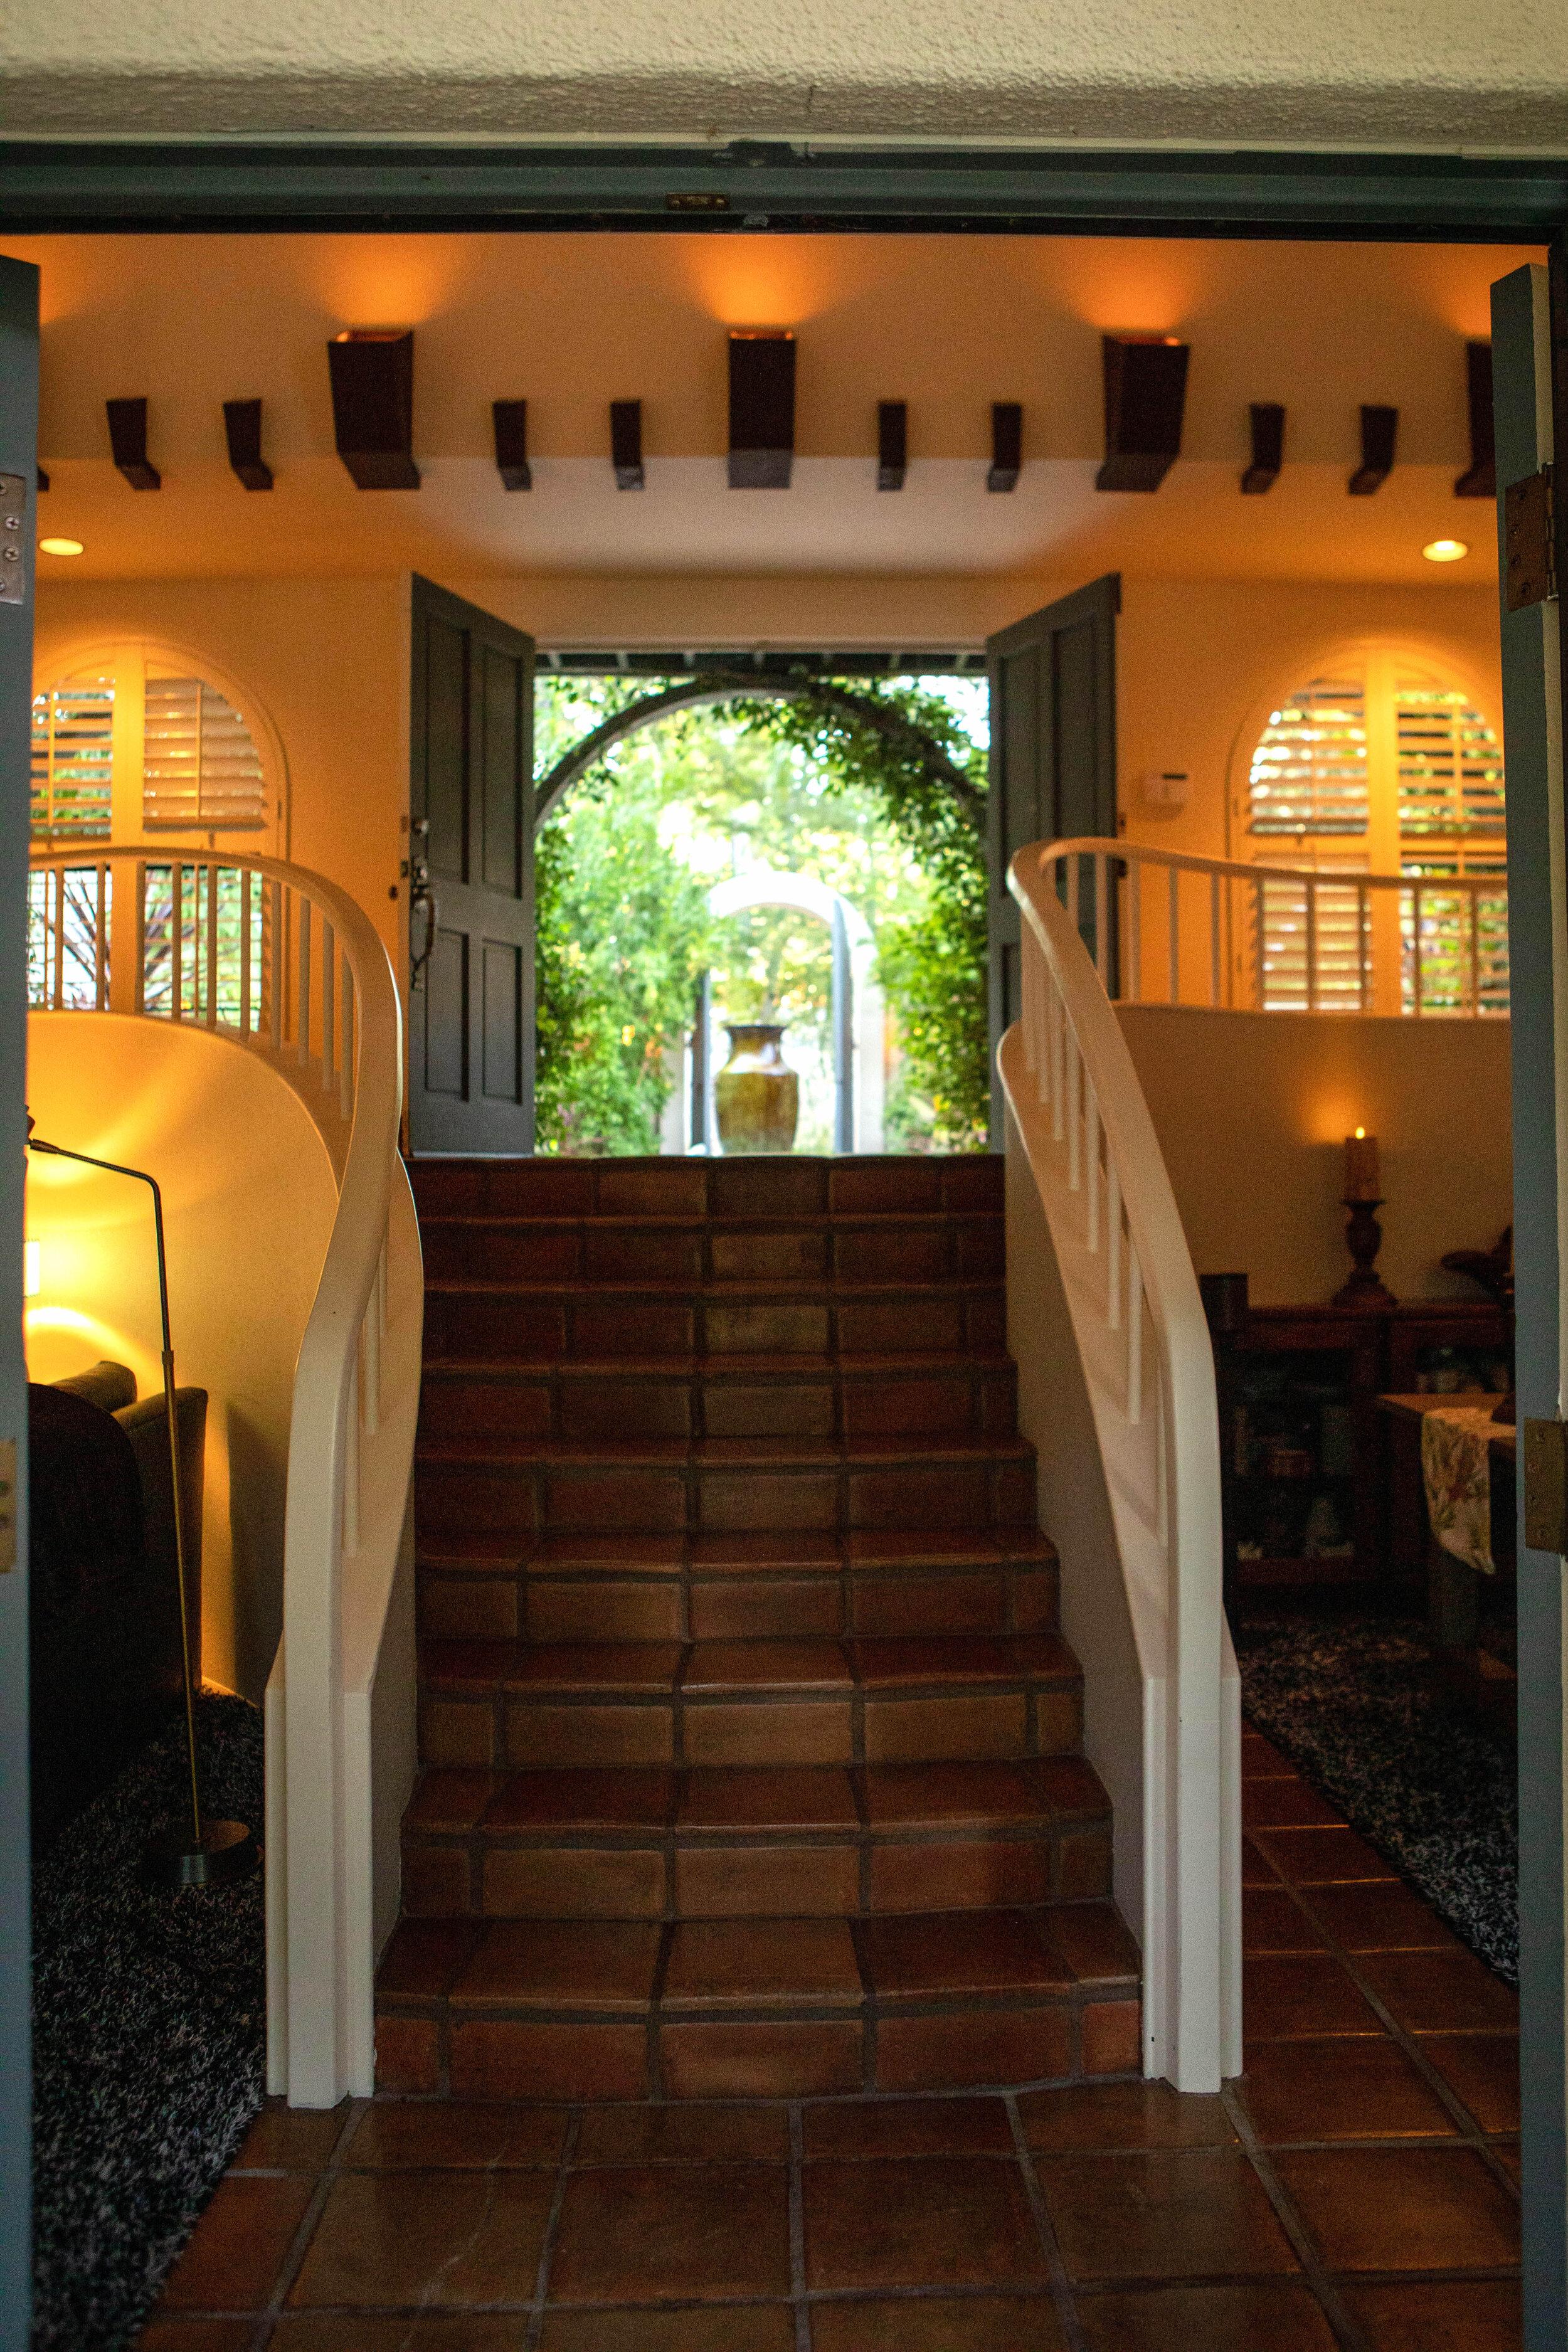 Staircase to Fountain.jpg